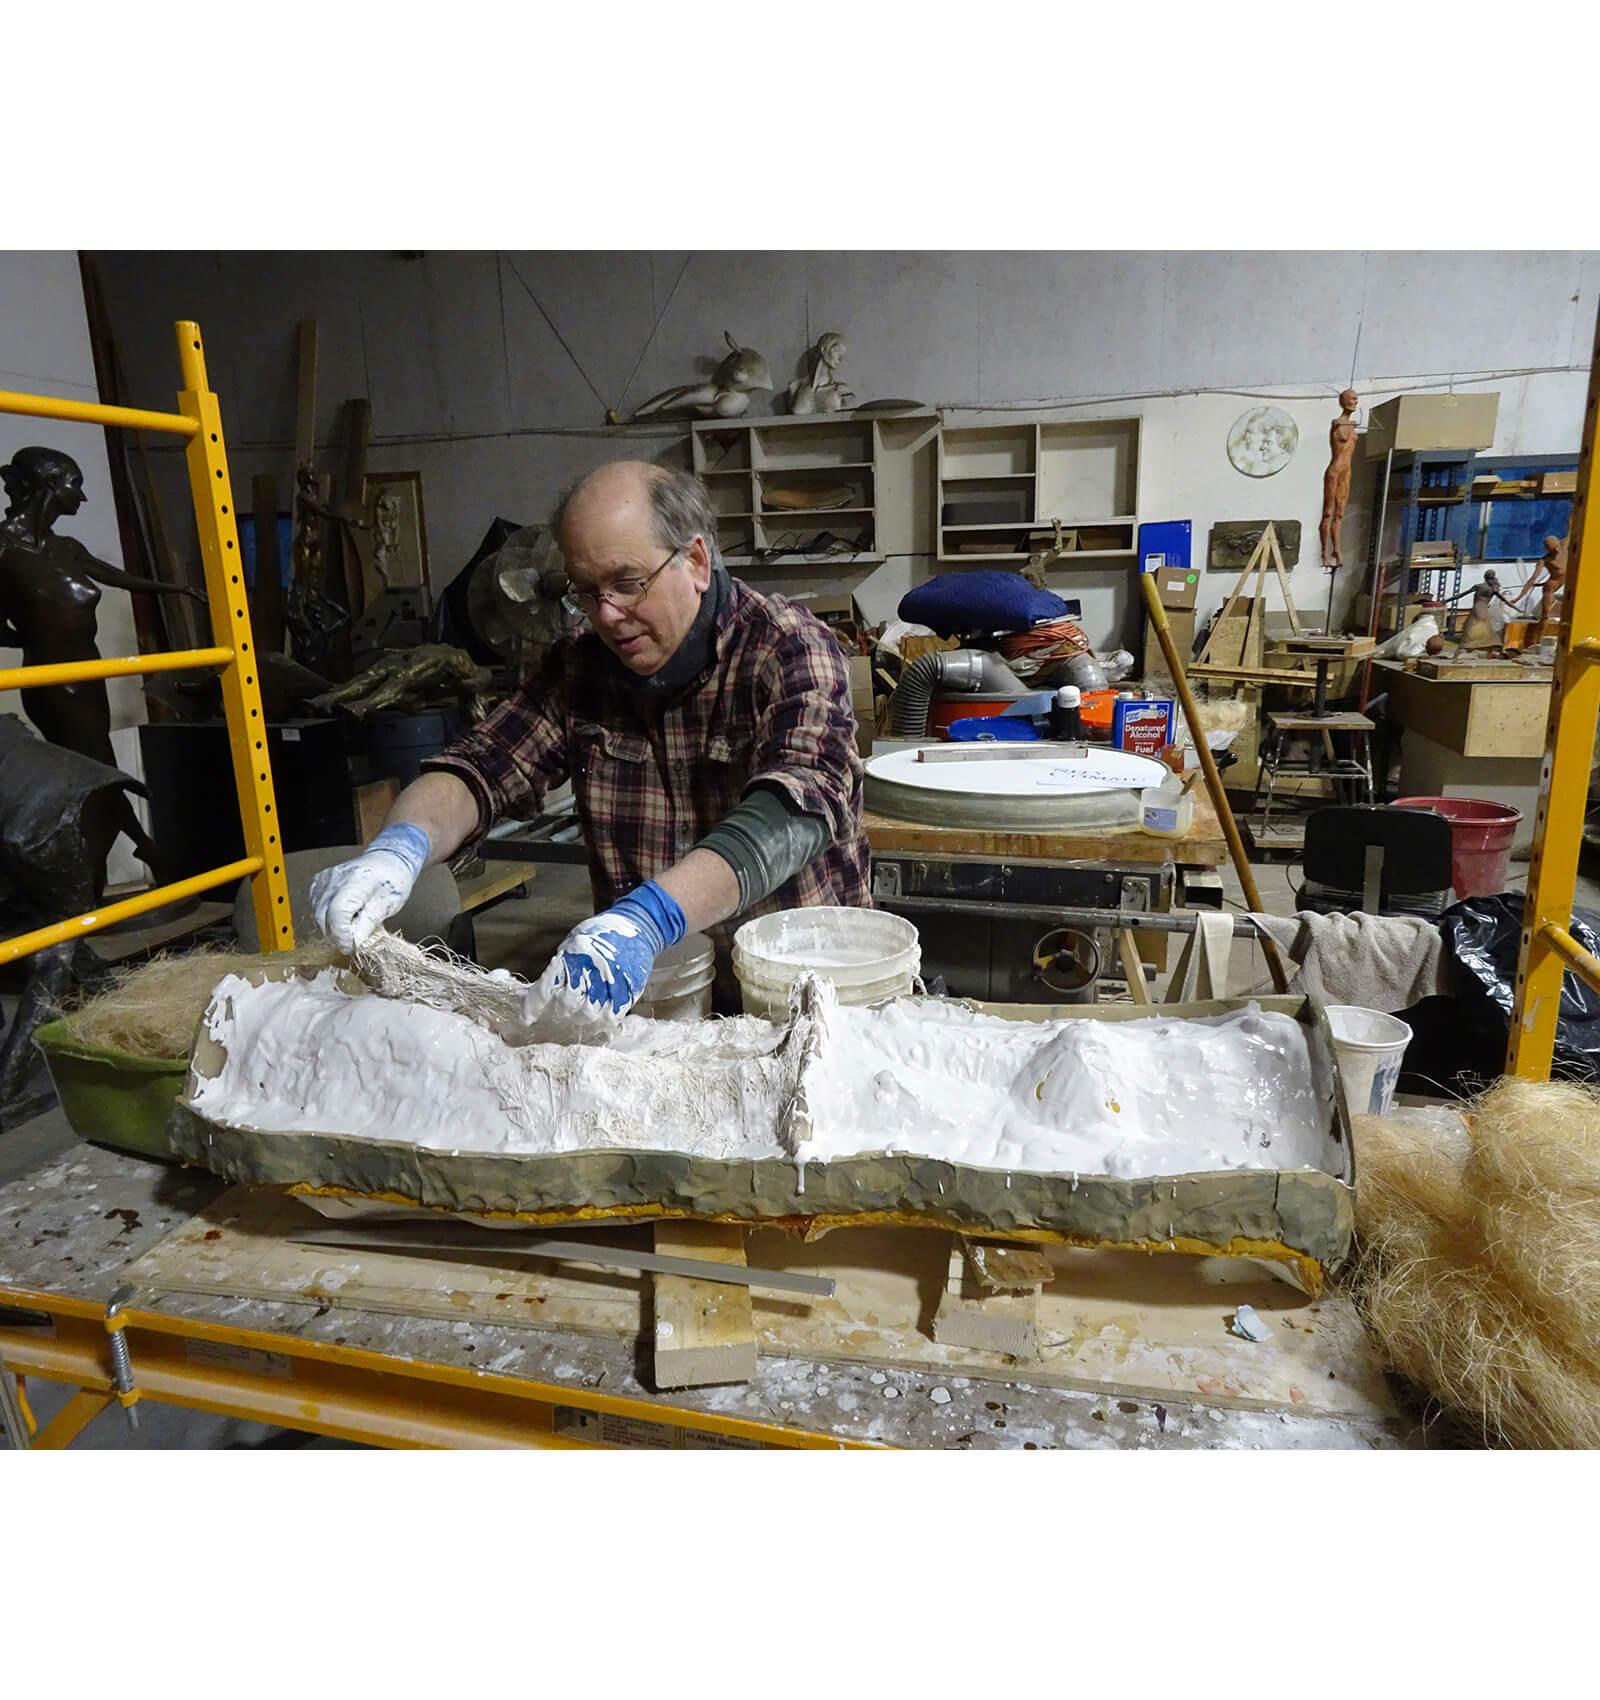 Sculptor andrew deVries applyin plaster back up mold over the rubber mold.